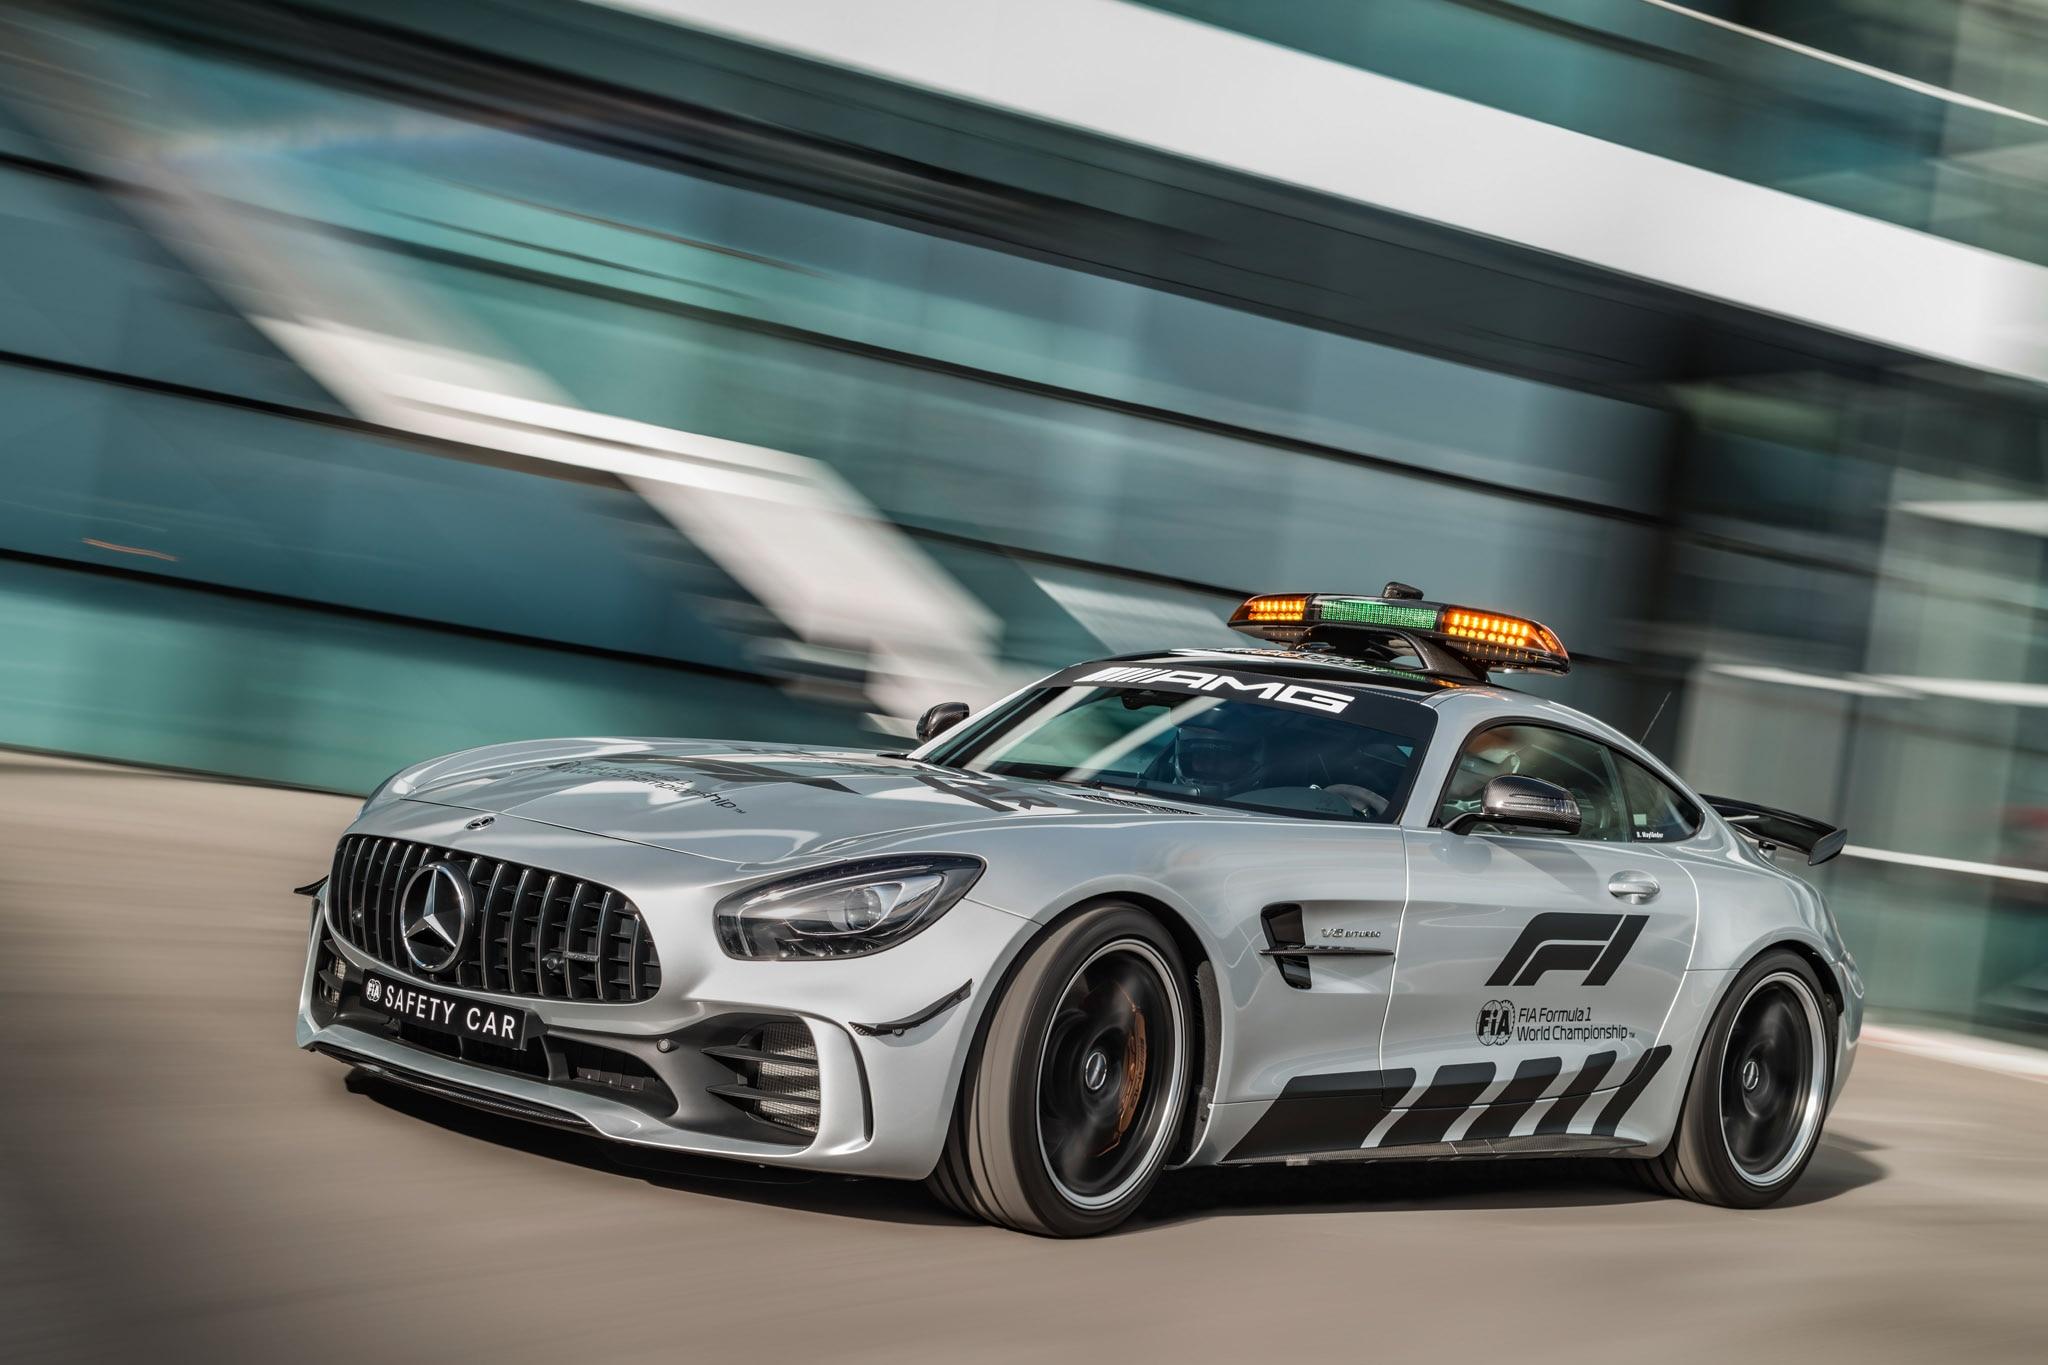 Mercedes AMG Official FIA F1 Safety Car 013